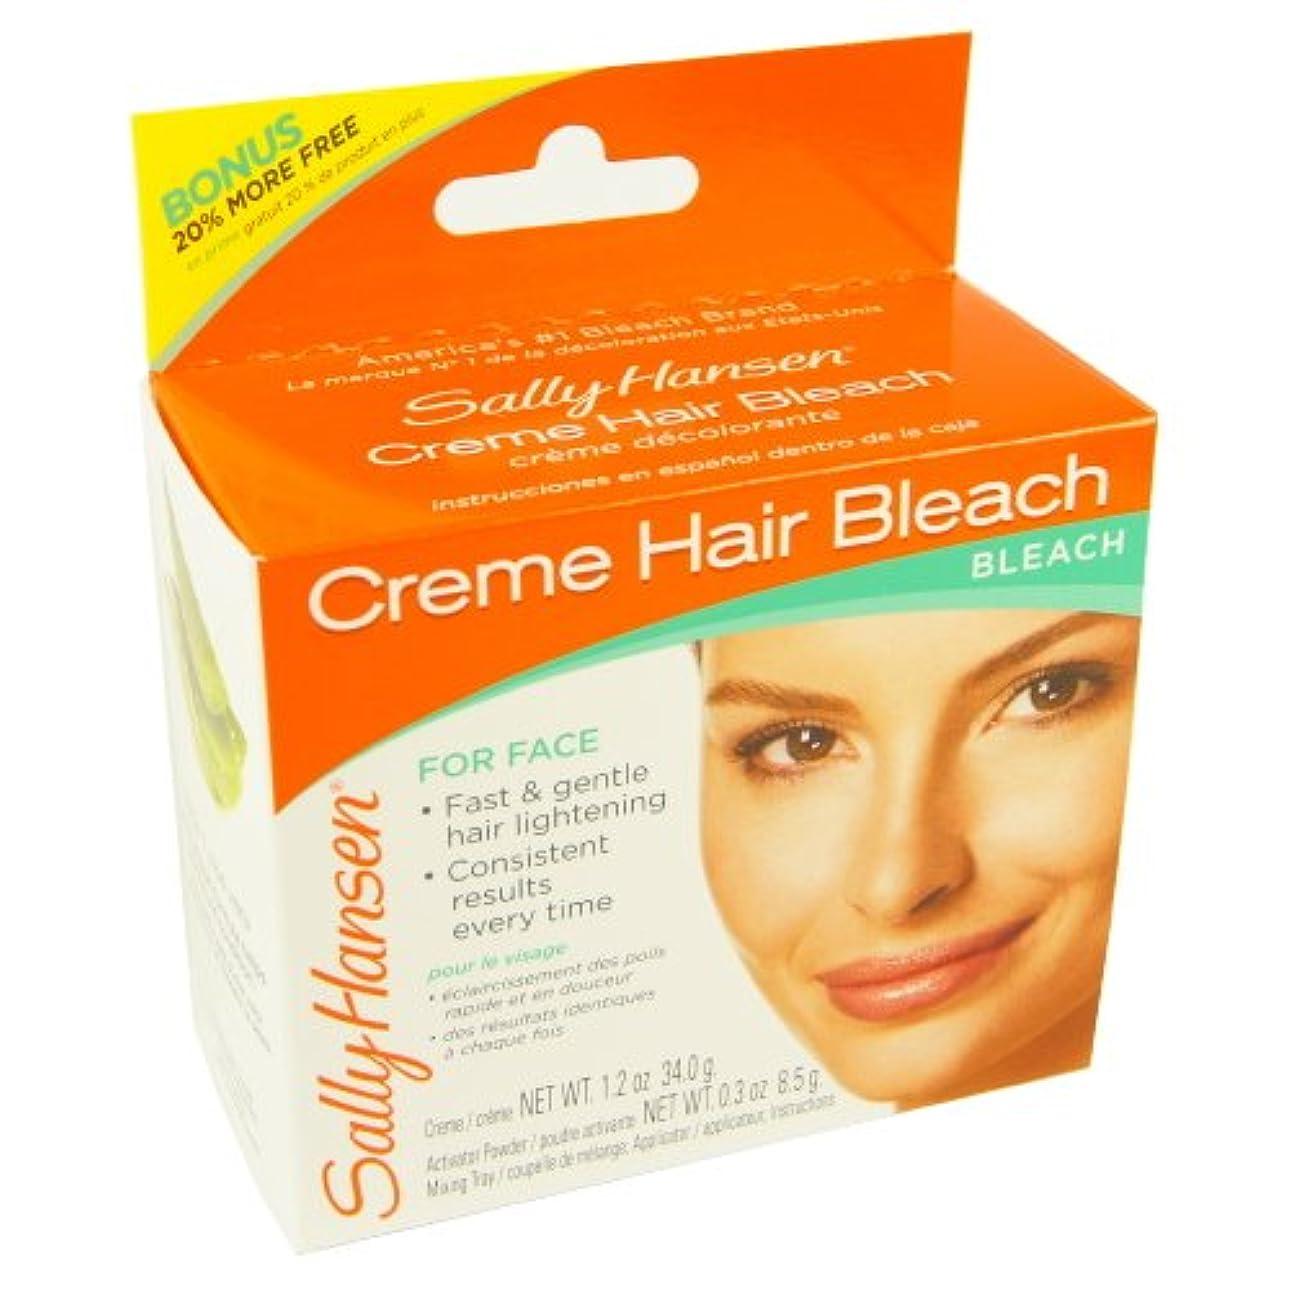 欠員指紋週間(3 Pack) SALLY HANSEN Creme Hair Bleach for Face - SH2000 (並行輸入品)